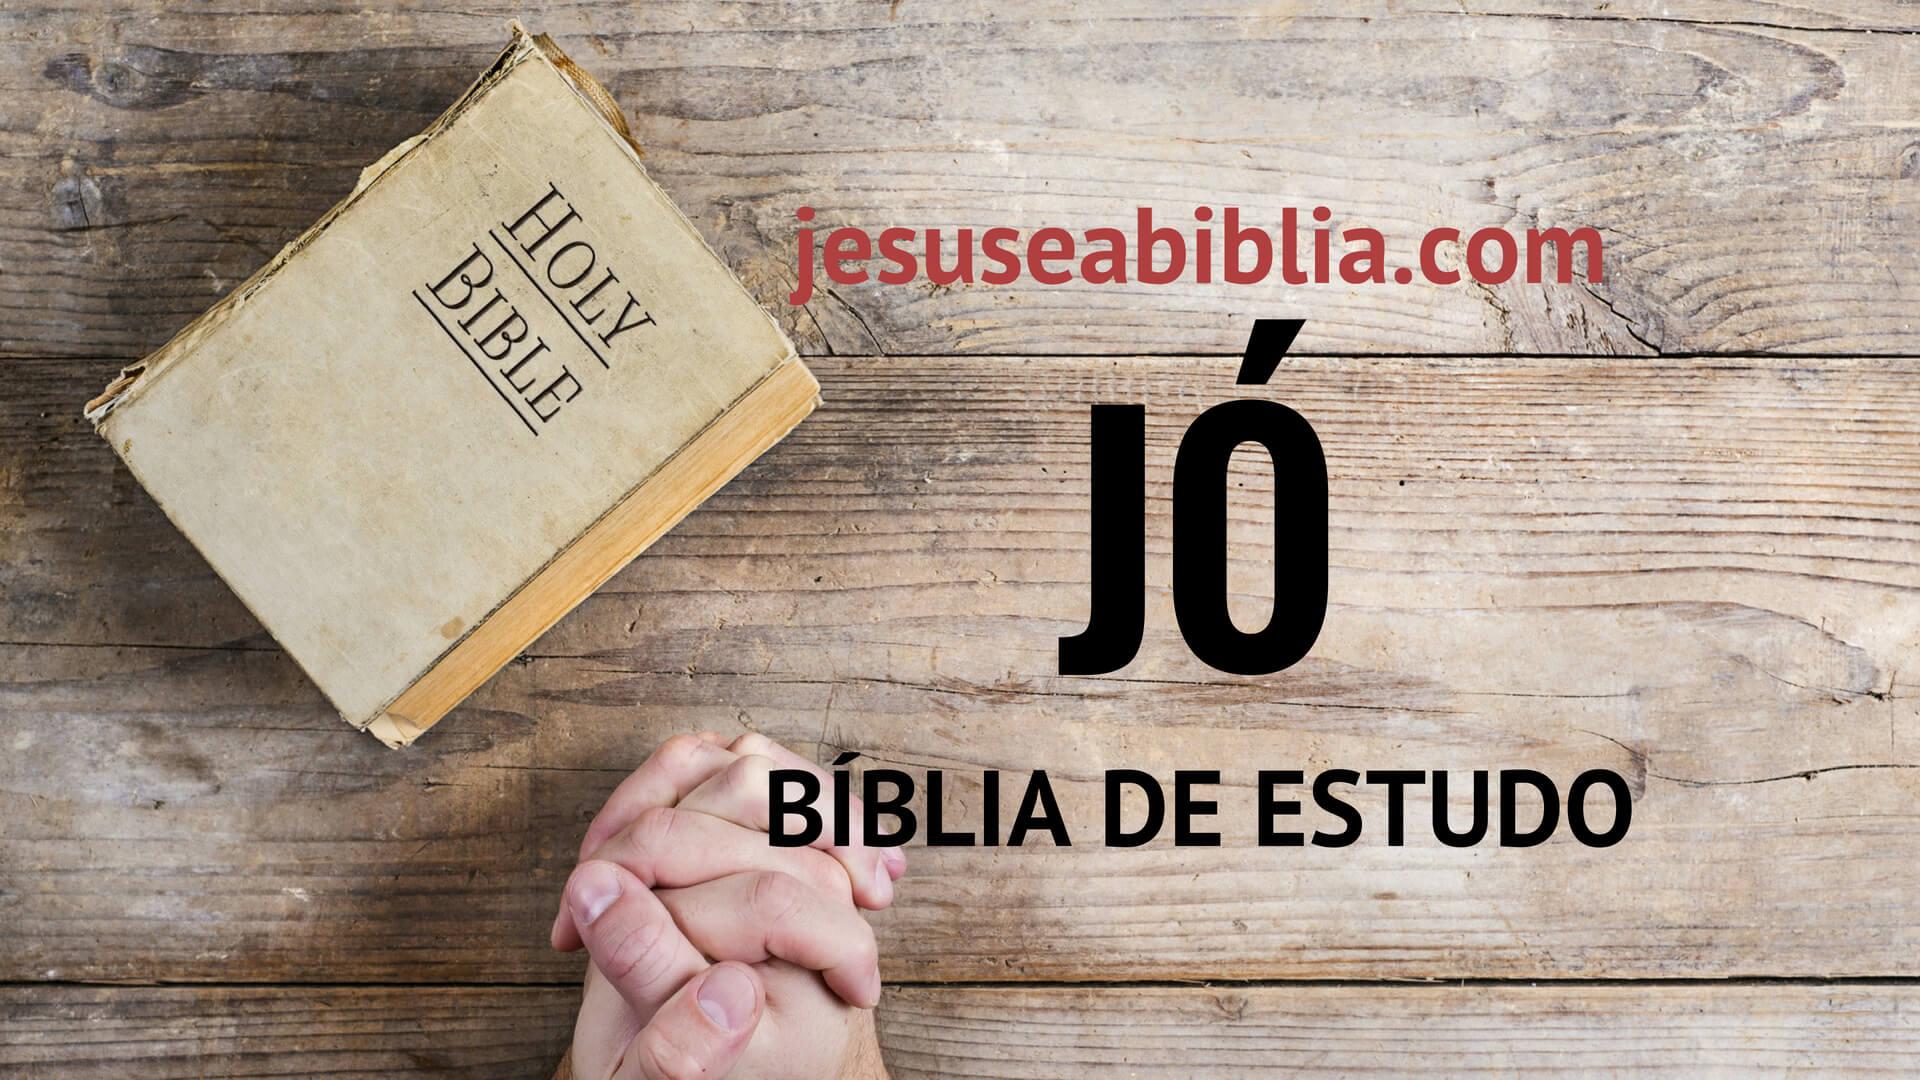 Jó - Bíblia de Estudo Online